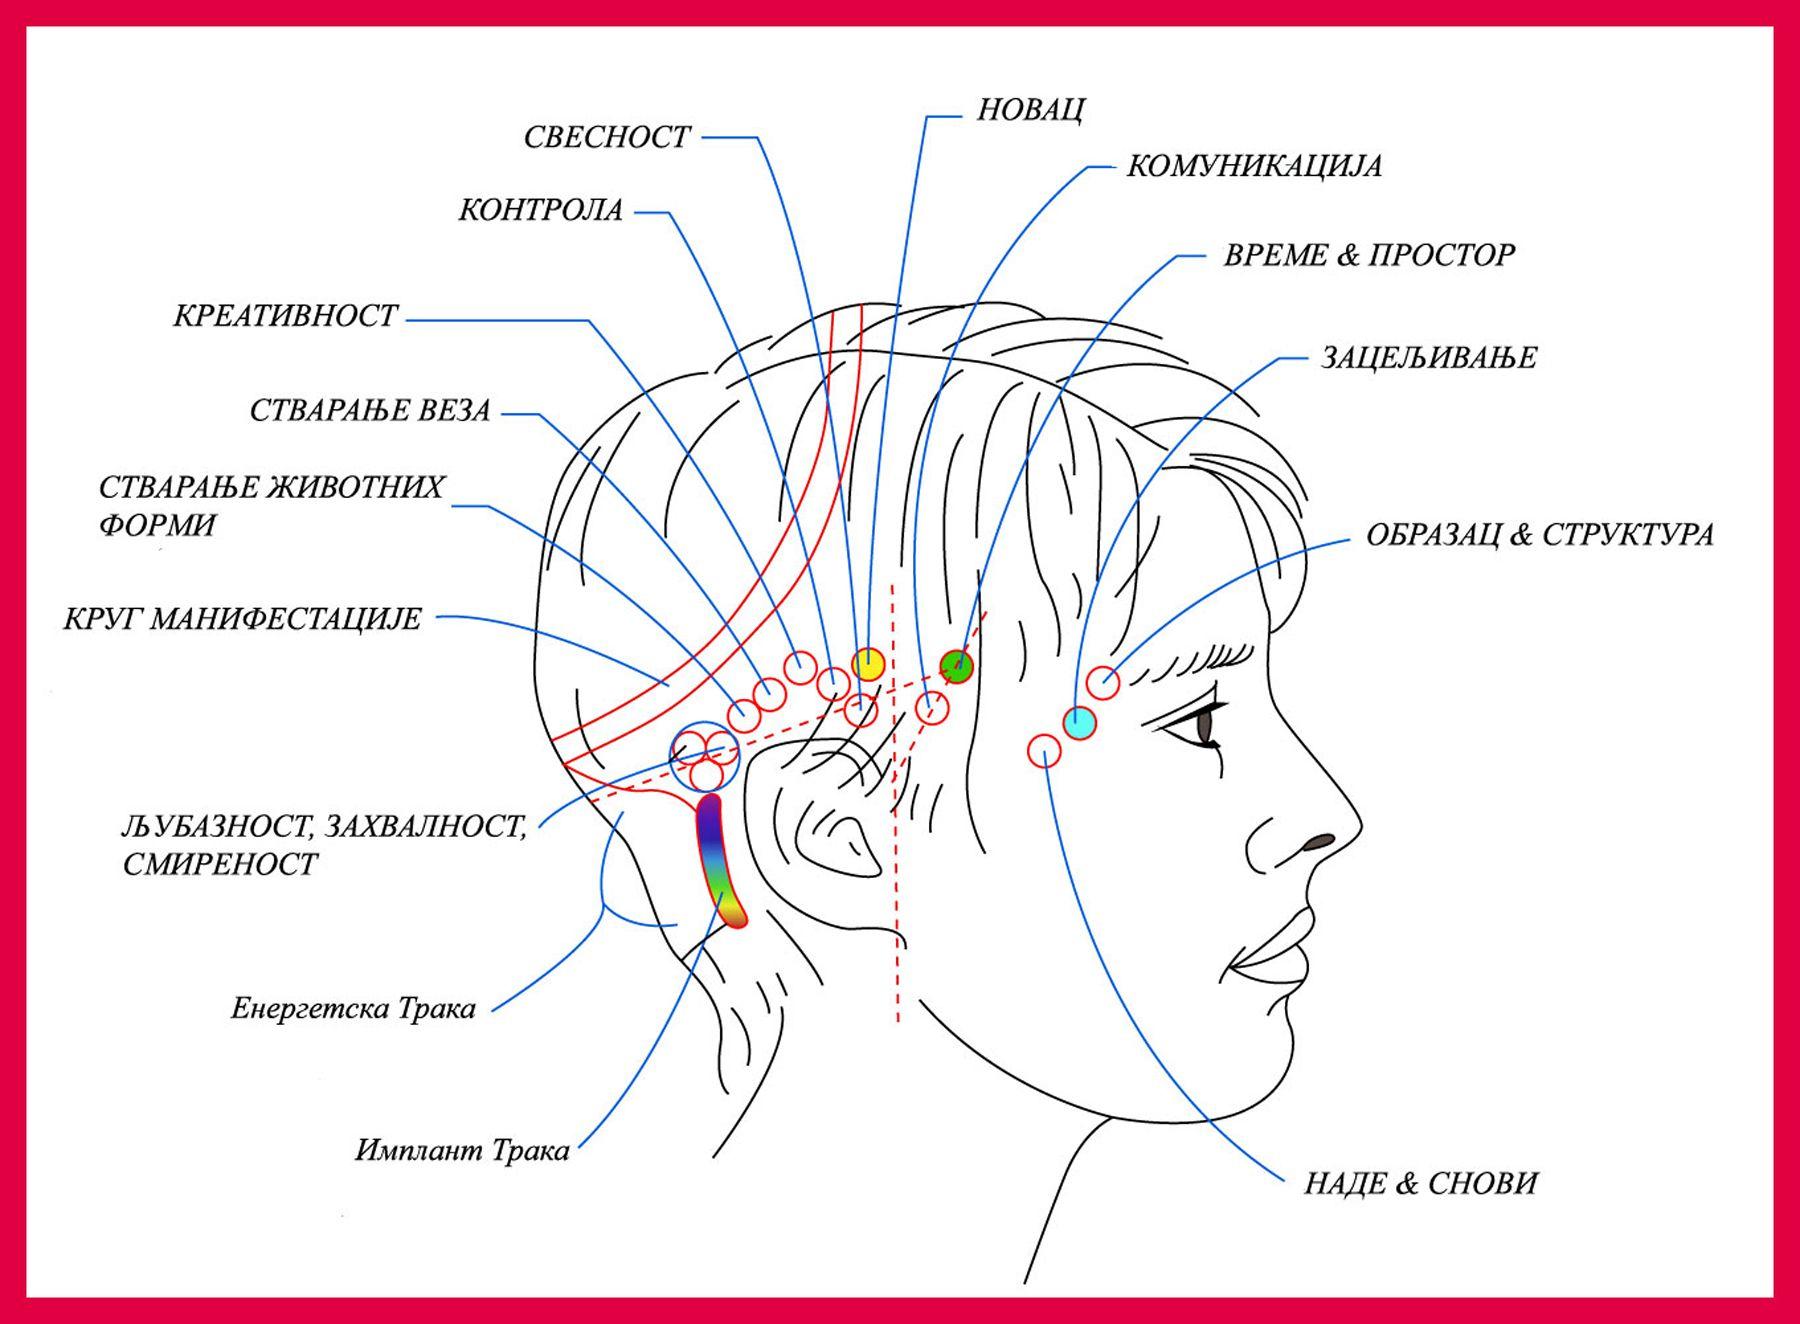 Snjezana Gottstein O Akses Bars Mariniranje Access Bars Access Consciousness Acupuncture